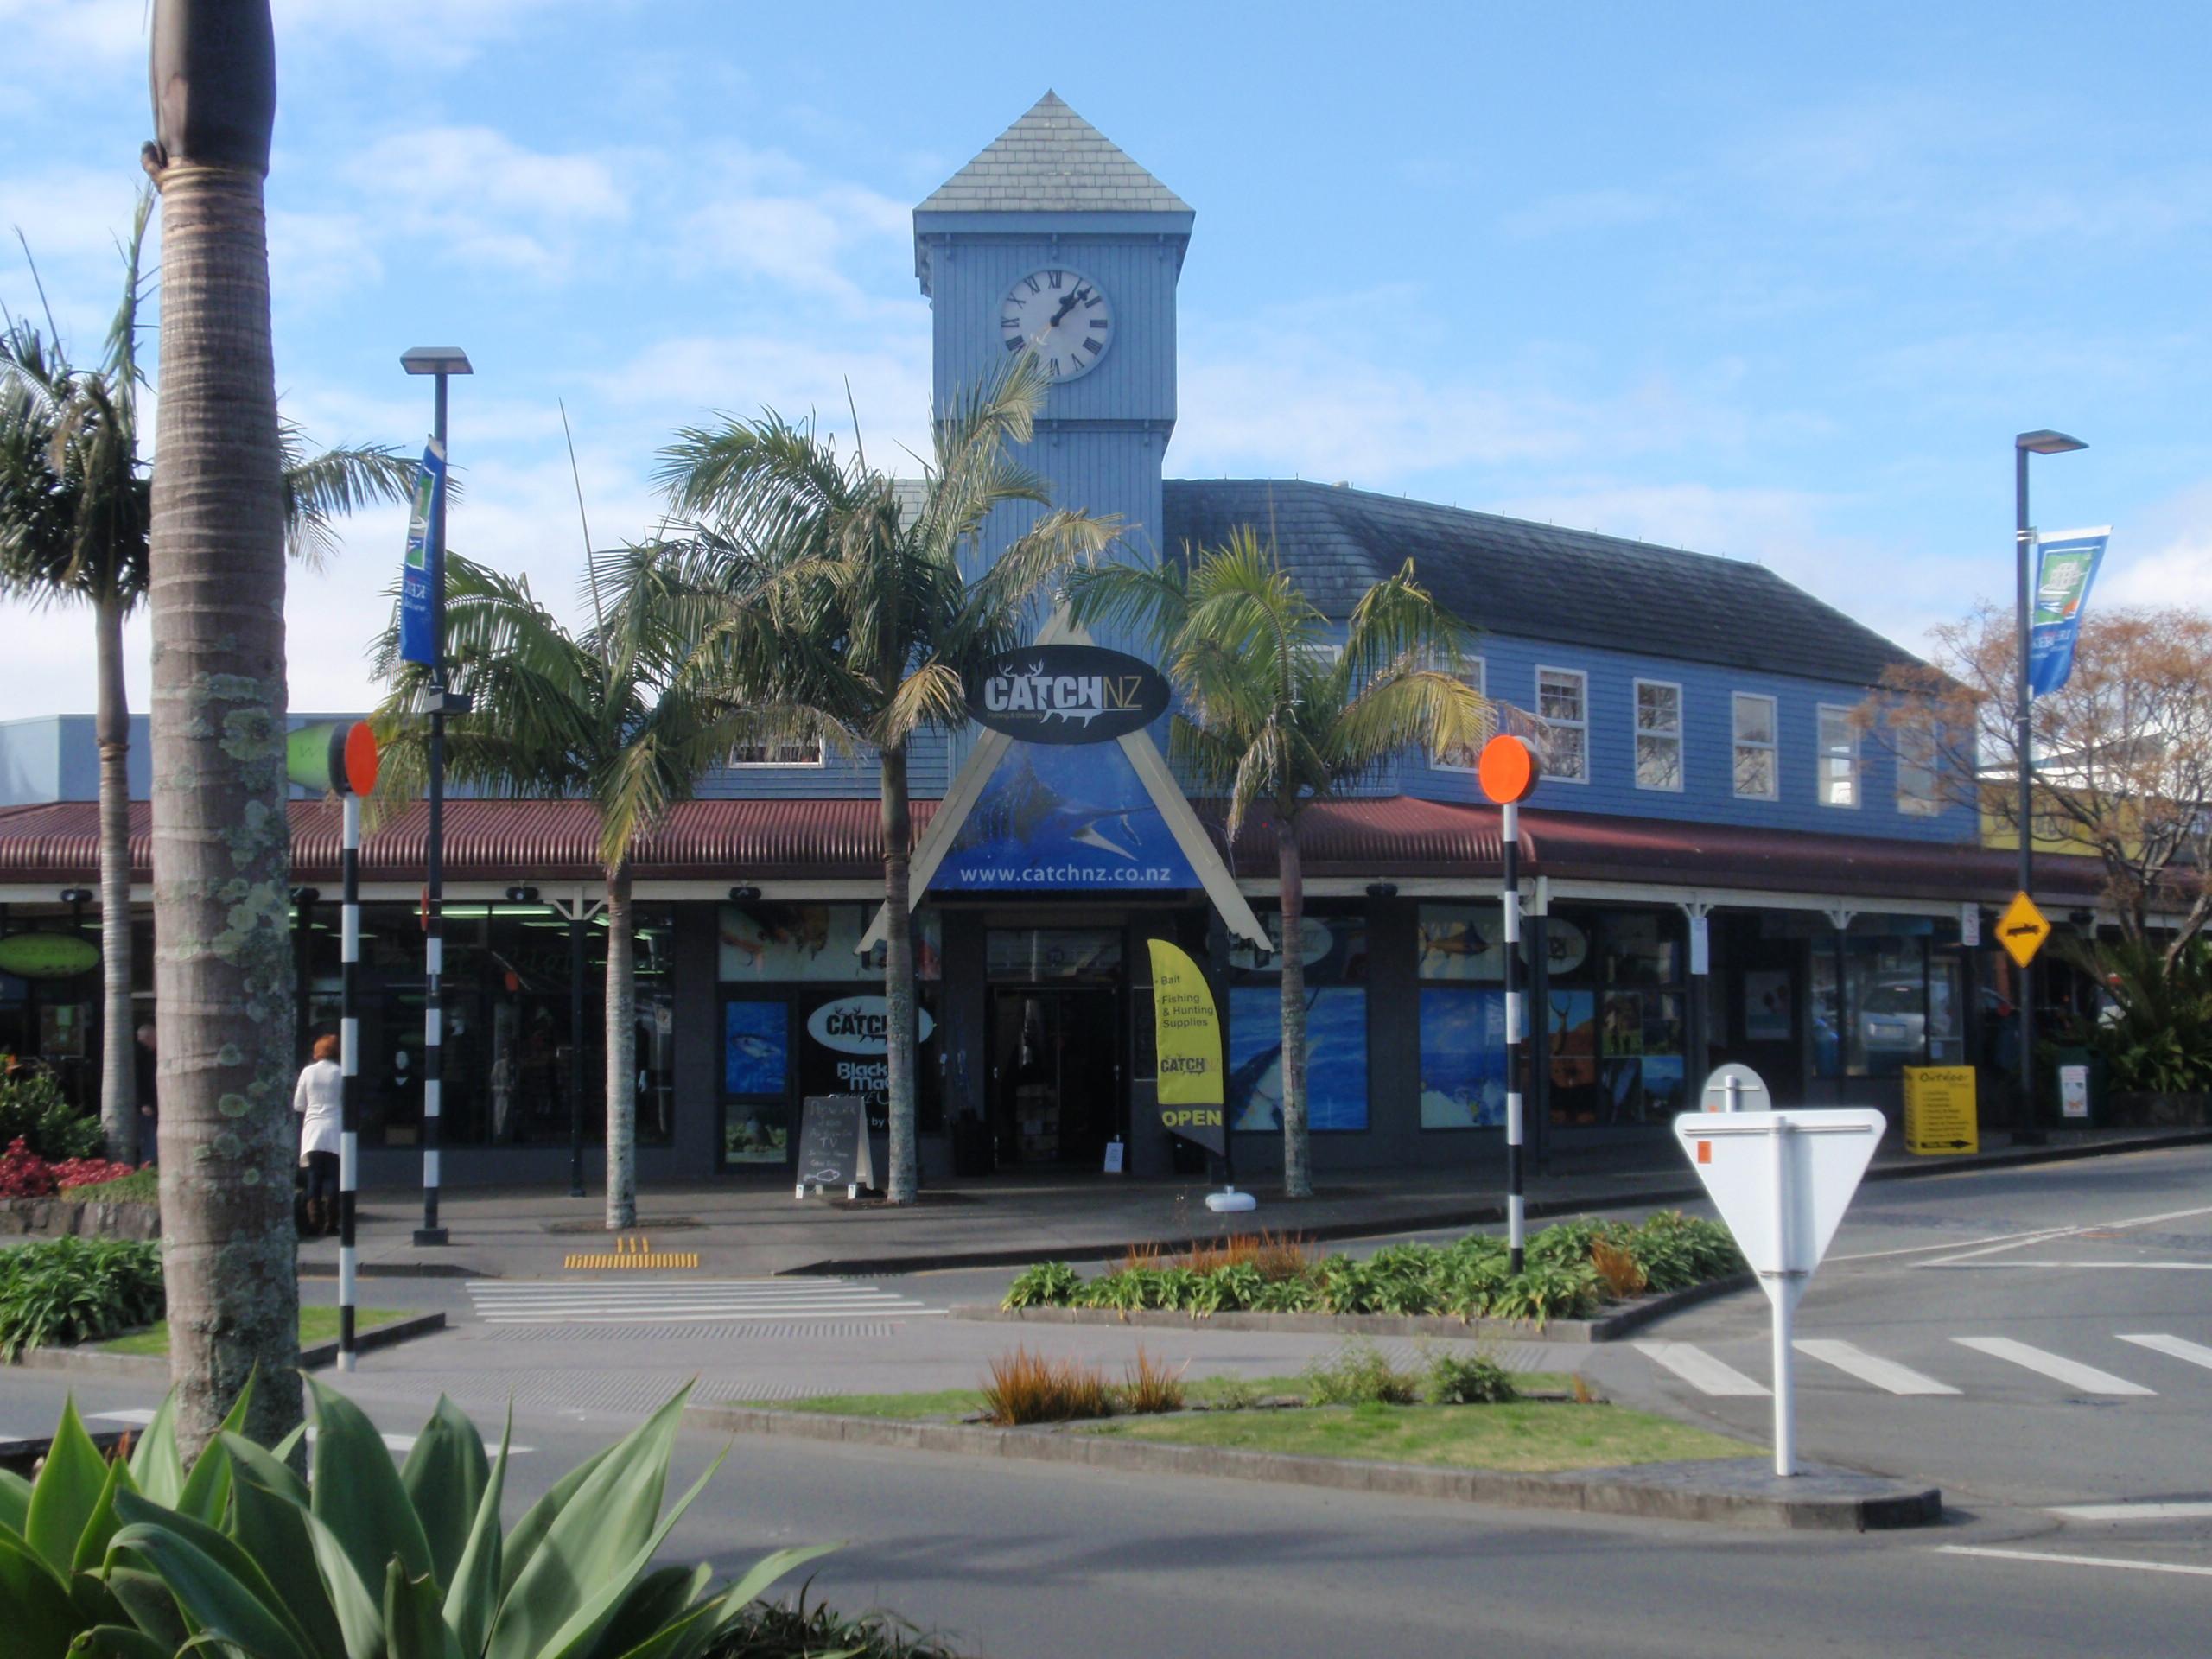 Kerikeri New Zealand  city photos gallery : Kerikeri Bay of Islands Northland New Zealand